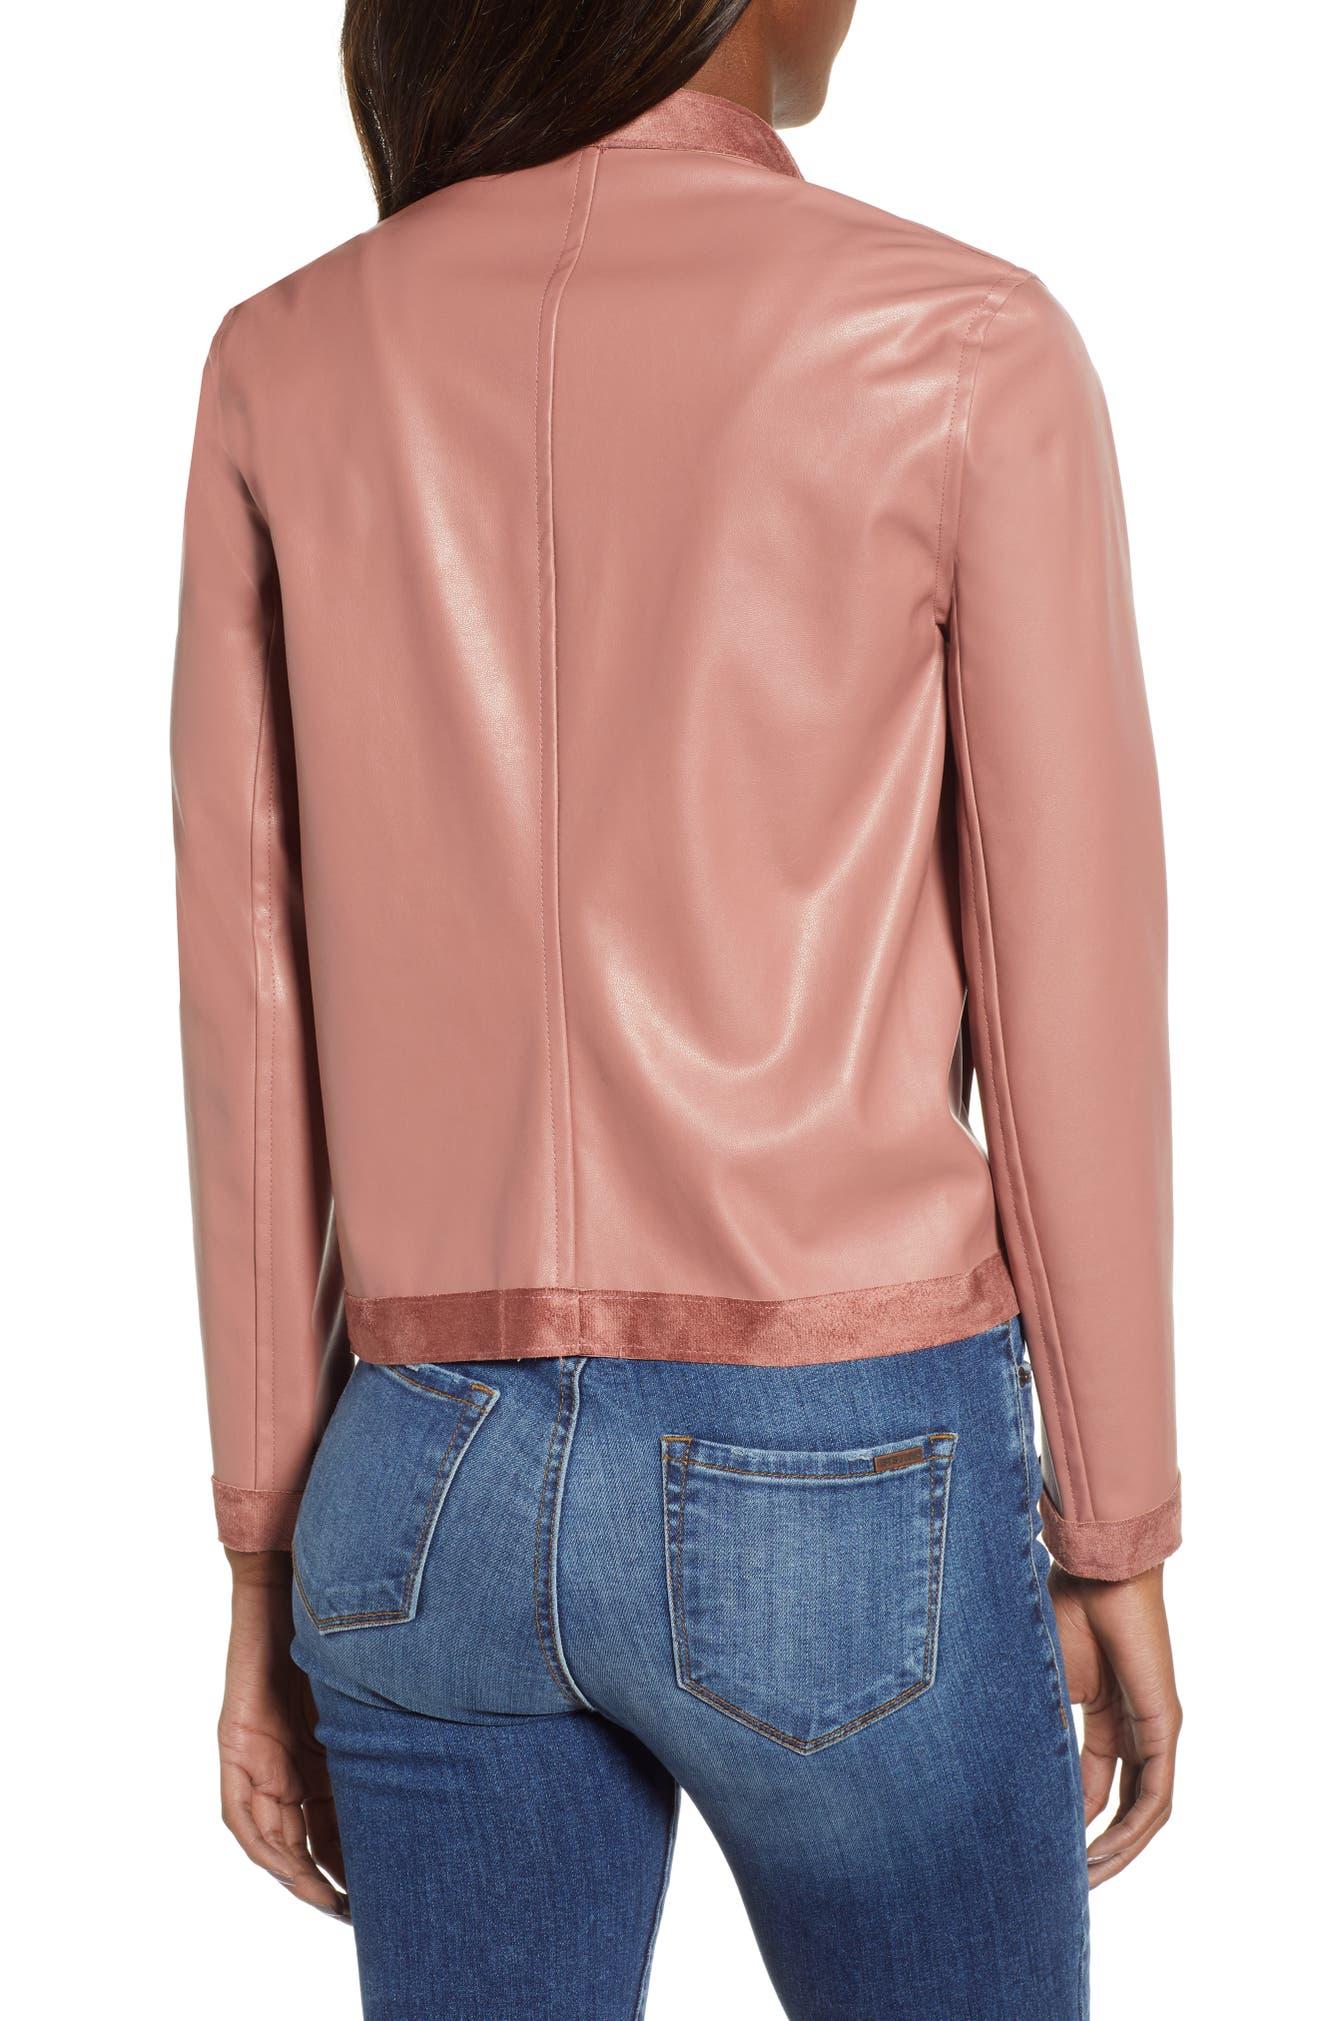 c75b8c509 Teagan Reversible Faux Leather Drape Front Jacket